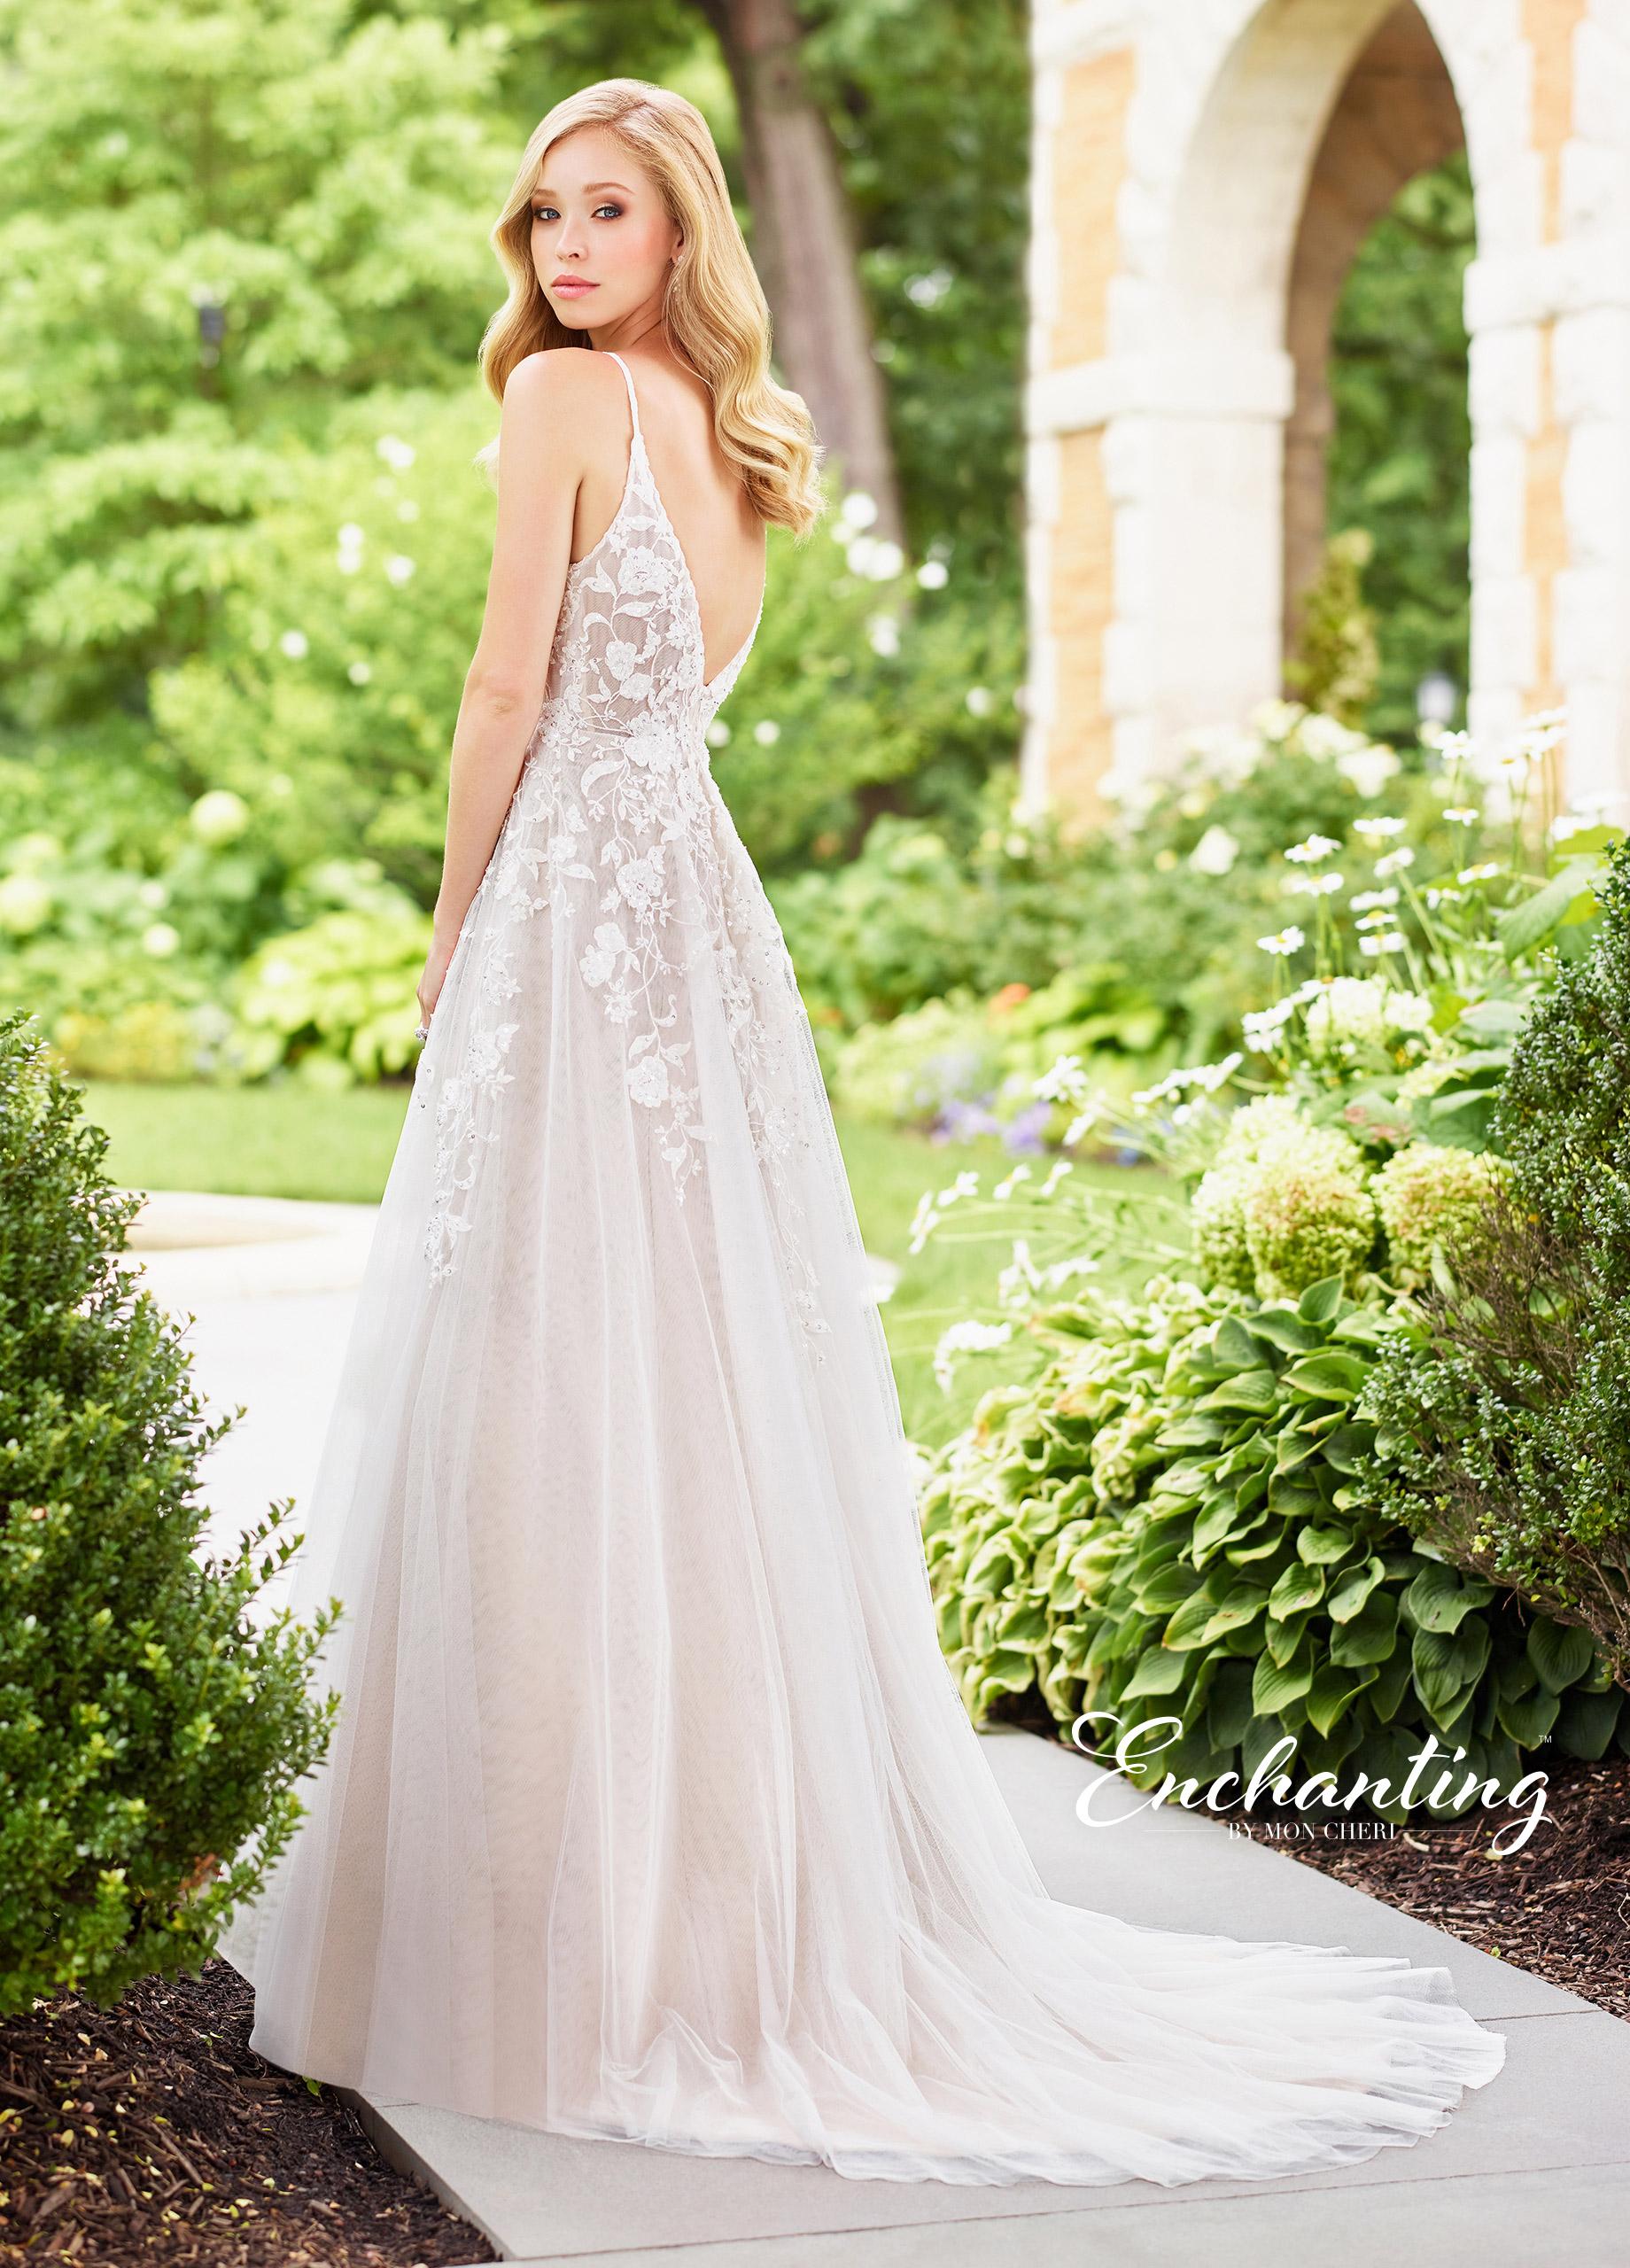 destination-wedding-dress-Enchanting-118136_B